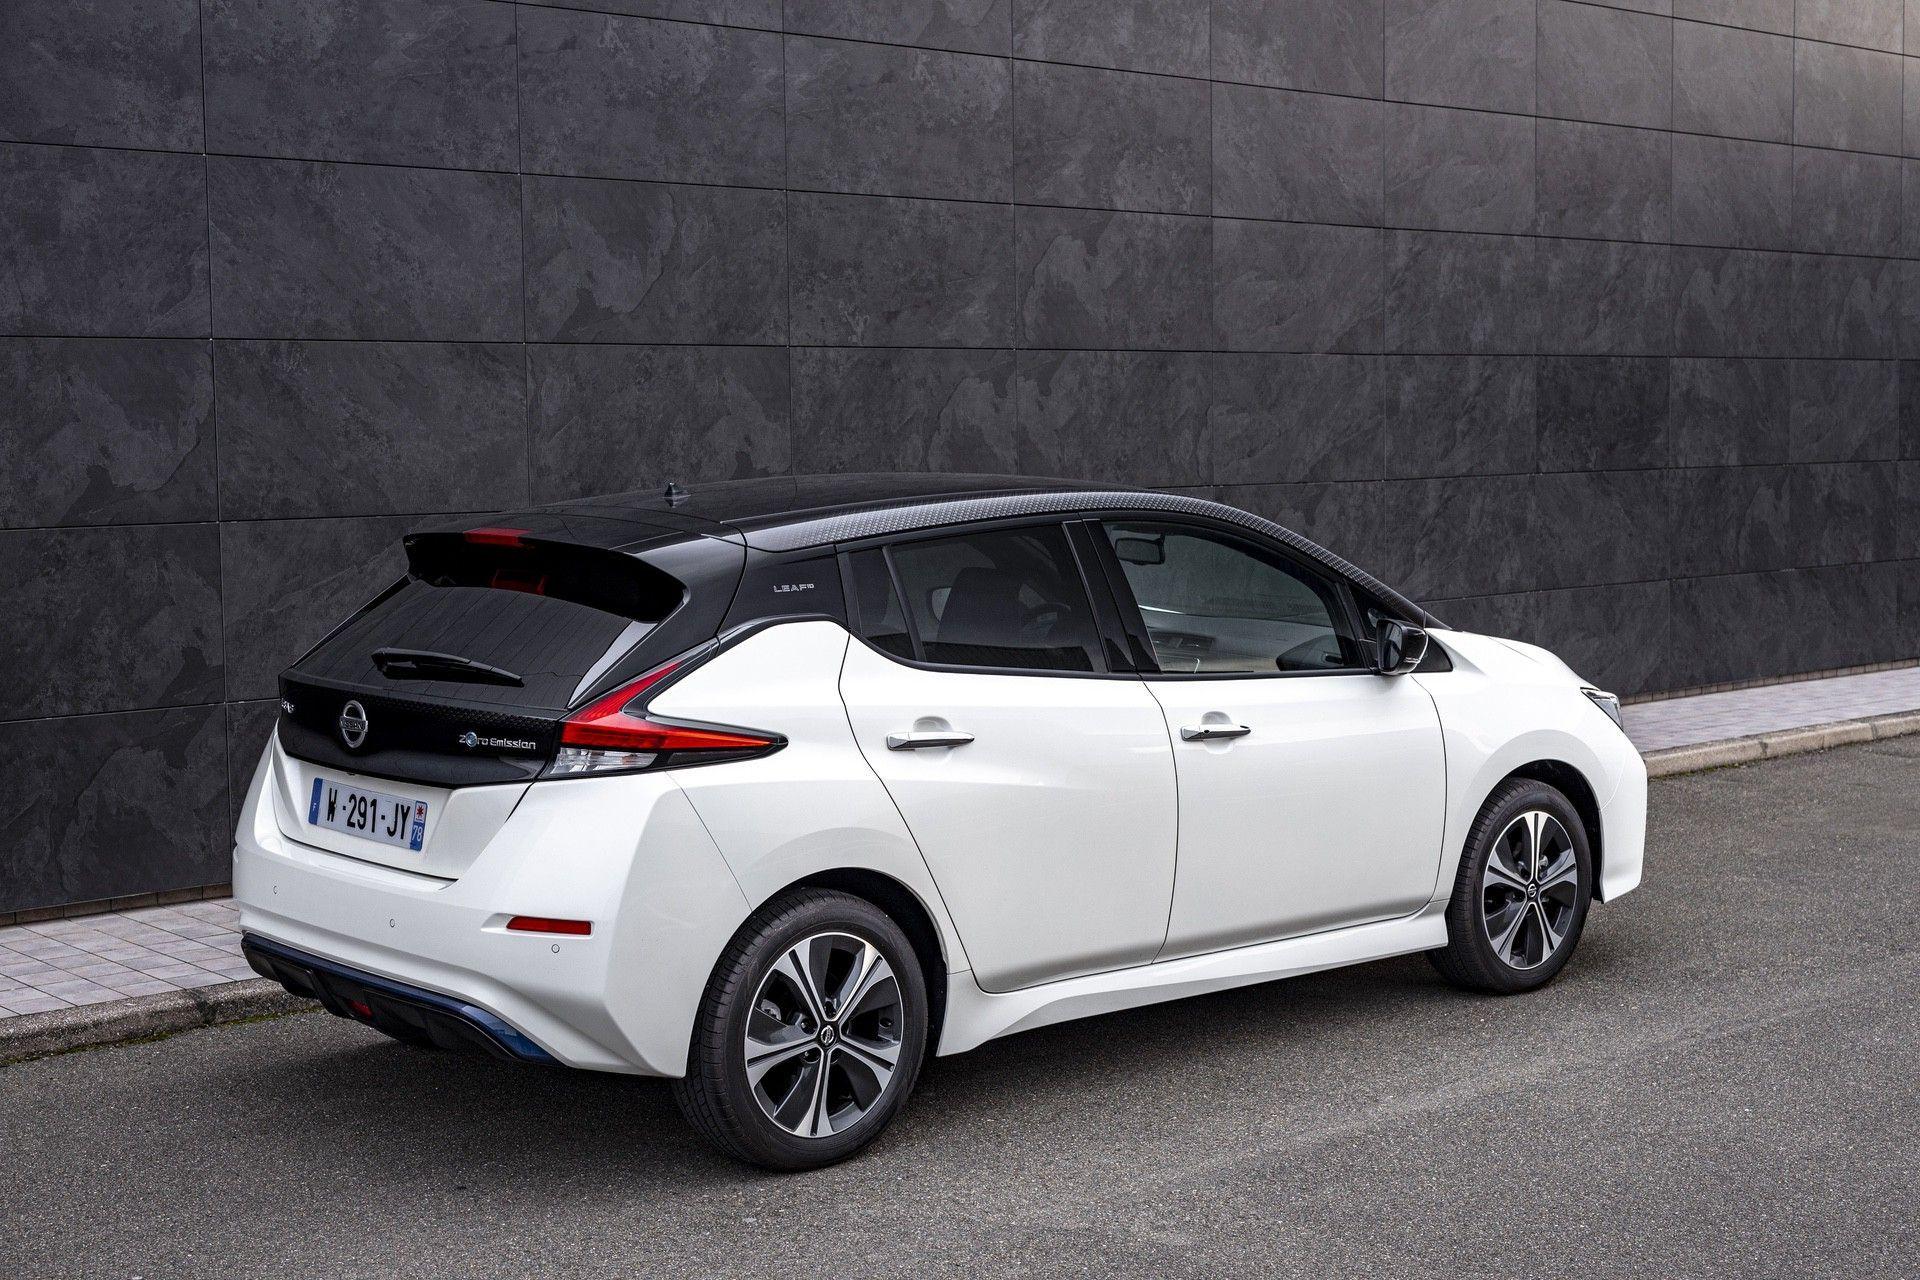 Nissan_Leaf10_special_edition-0007